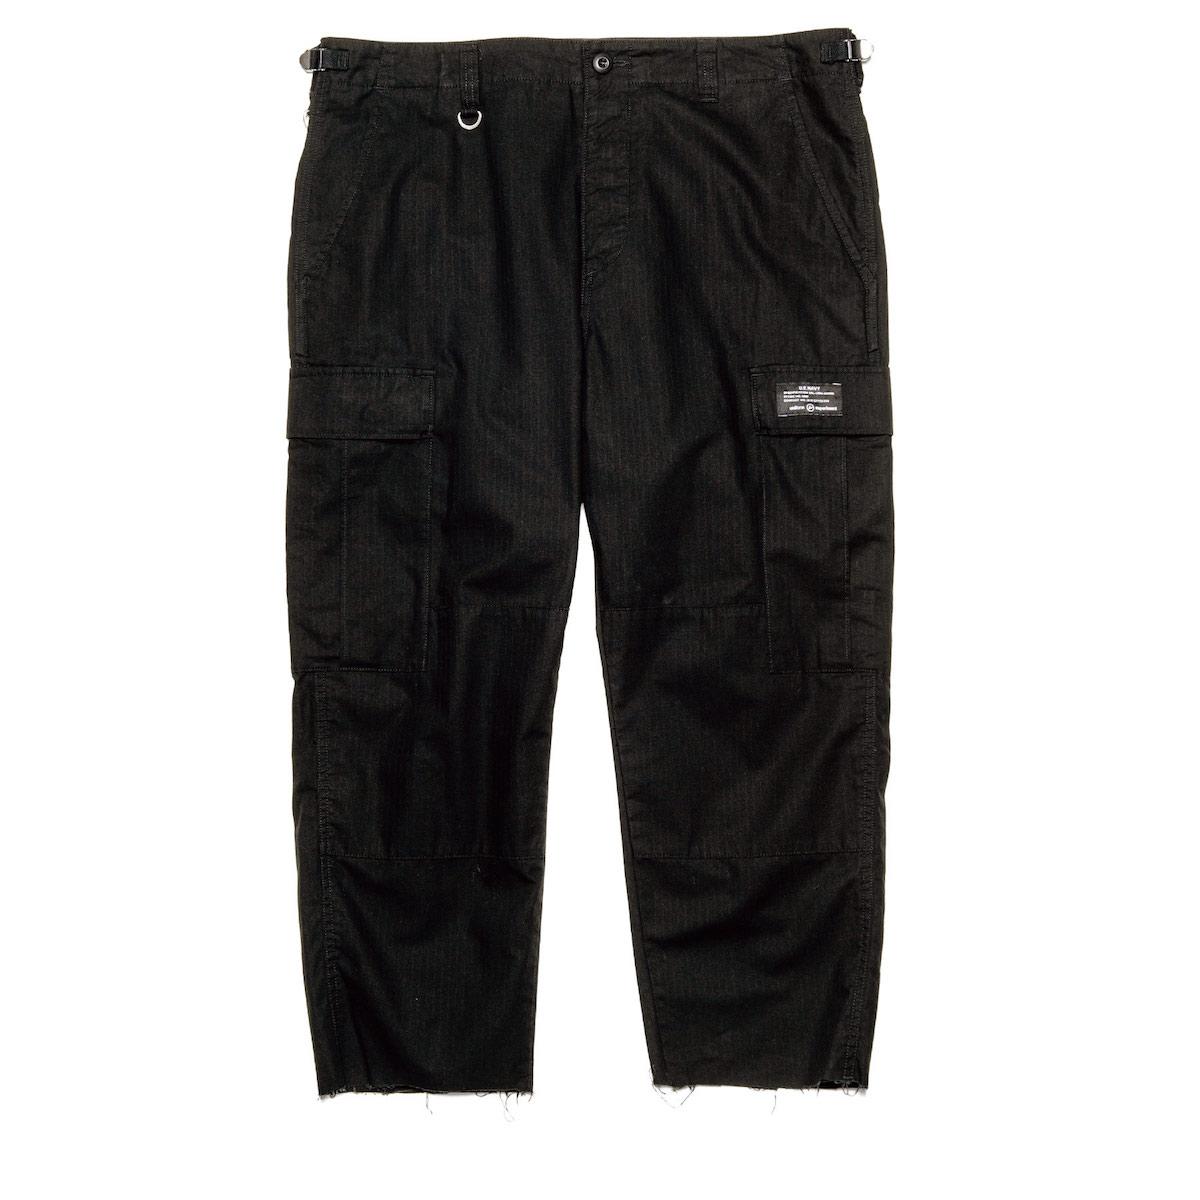 uniform experiment / HEM CUT OFF CROPPED CARGO PANTS (Black)